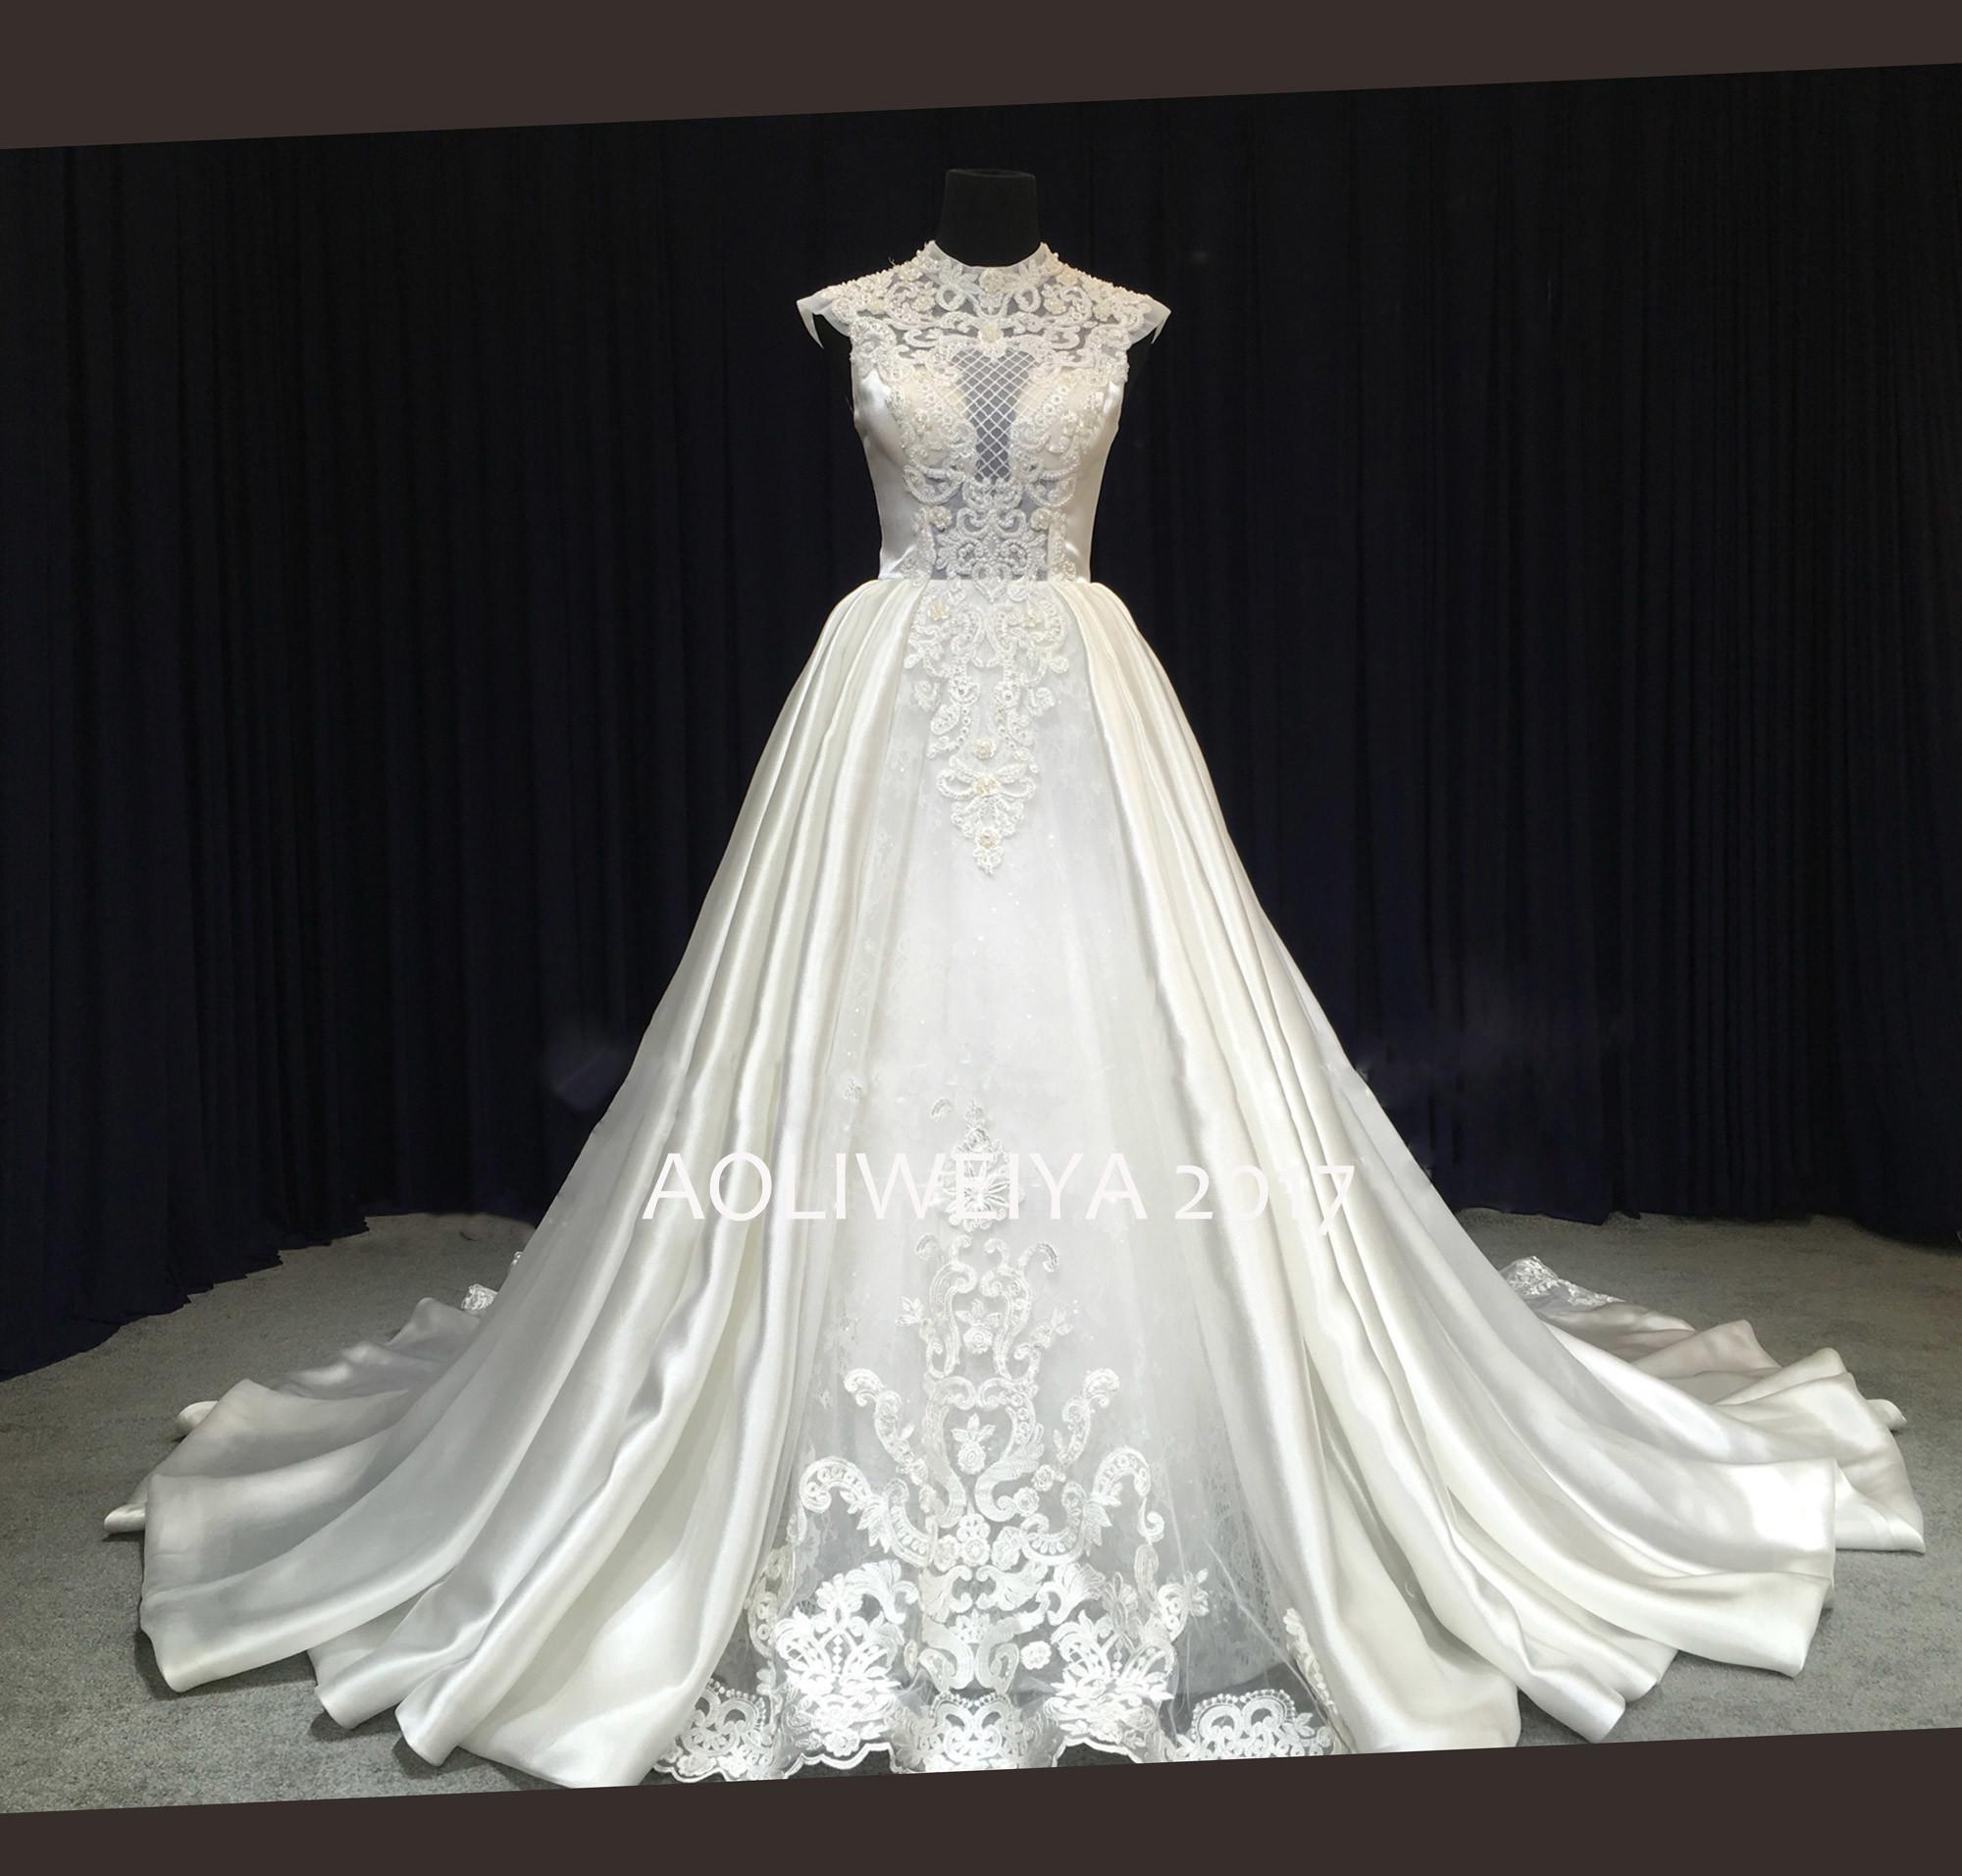 Aoliweiya 2017 New Arrival Design Elegant Lace Wedding Dress